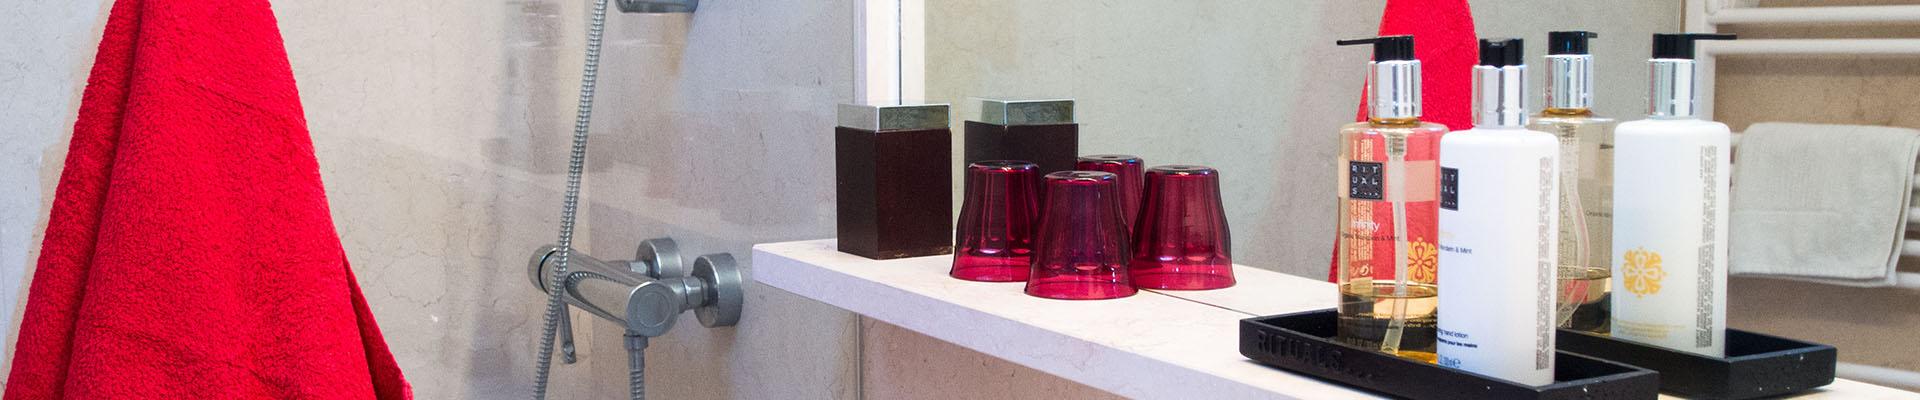 Casa-Jose-Ricardo-facilities_0003_4